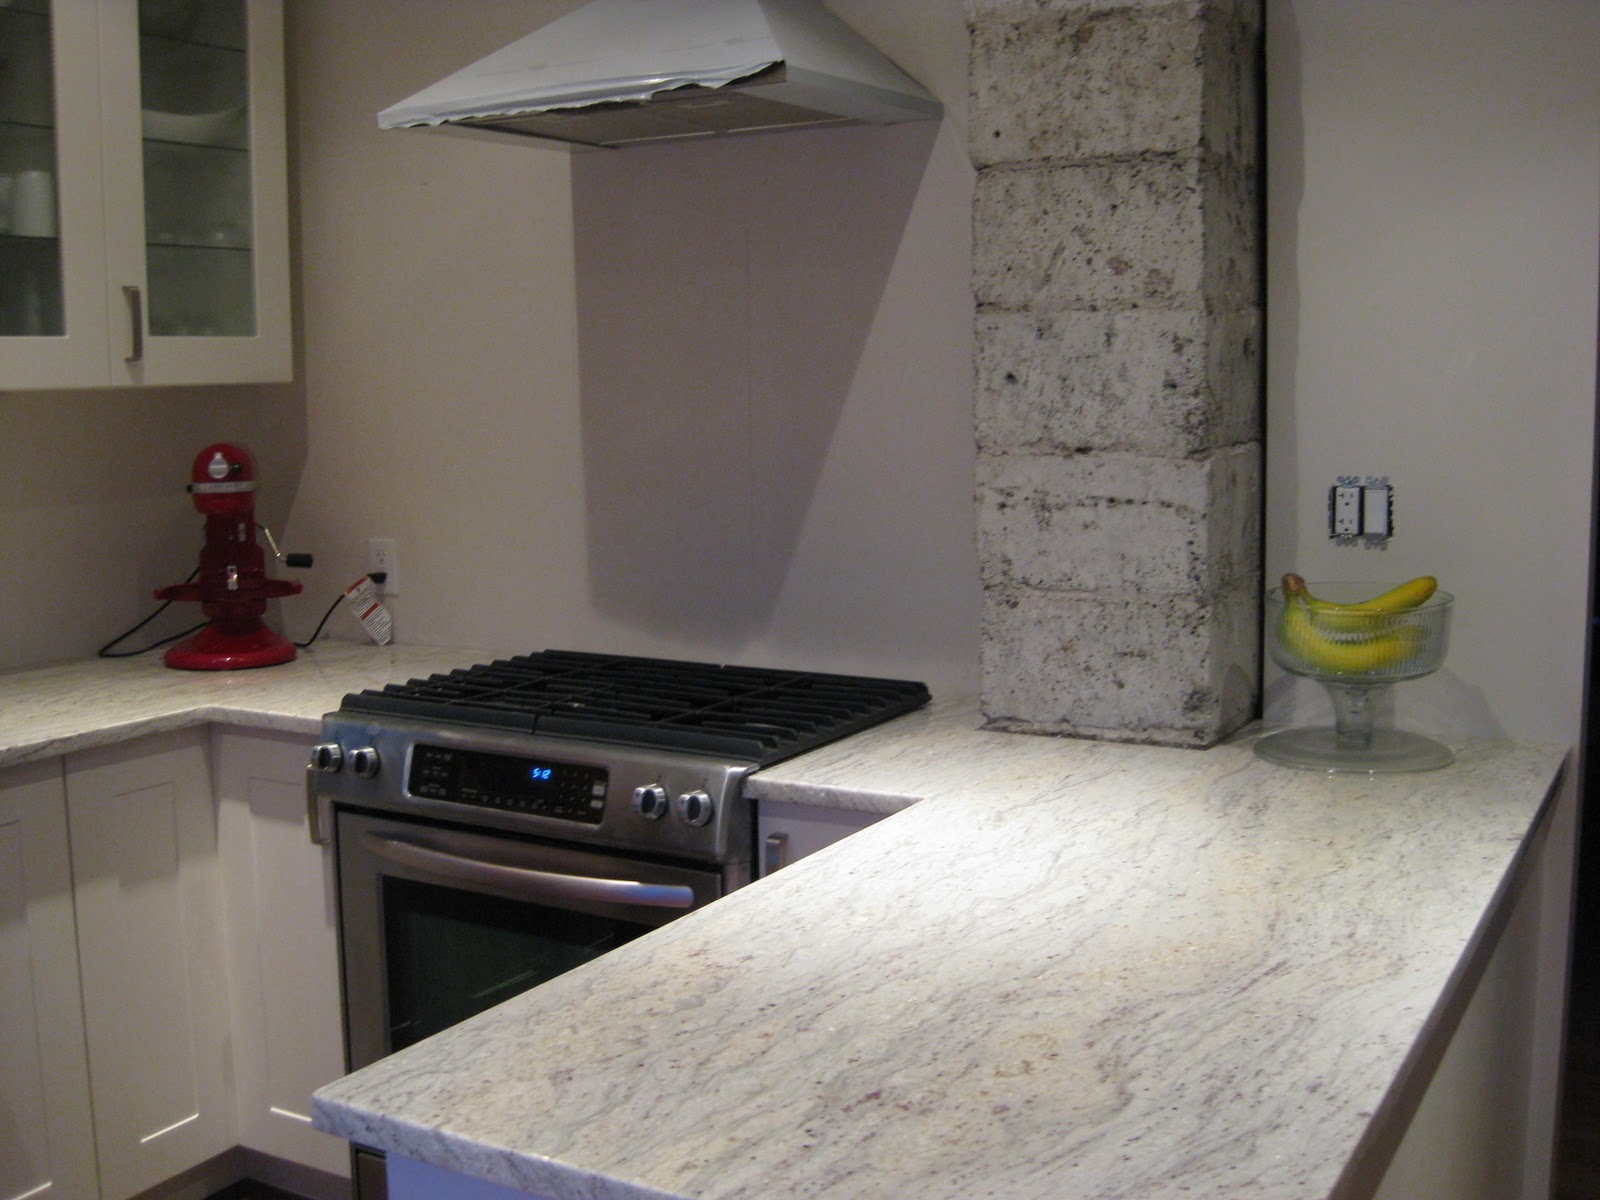 Kitchen Countertops Without Backsplash Adventures At 1628 Kitchen Part Iii